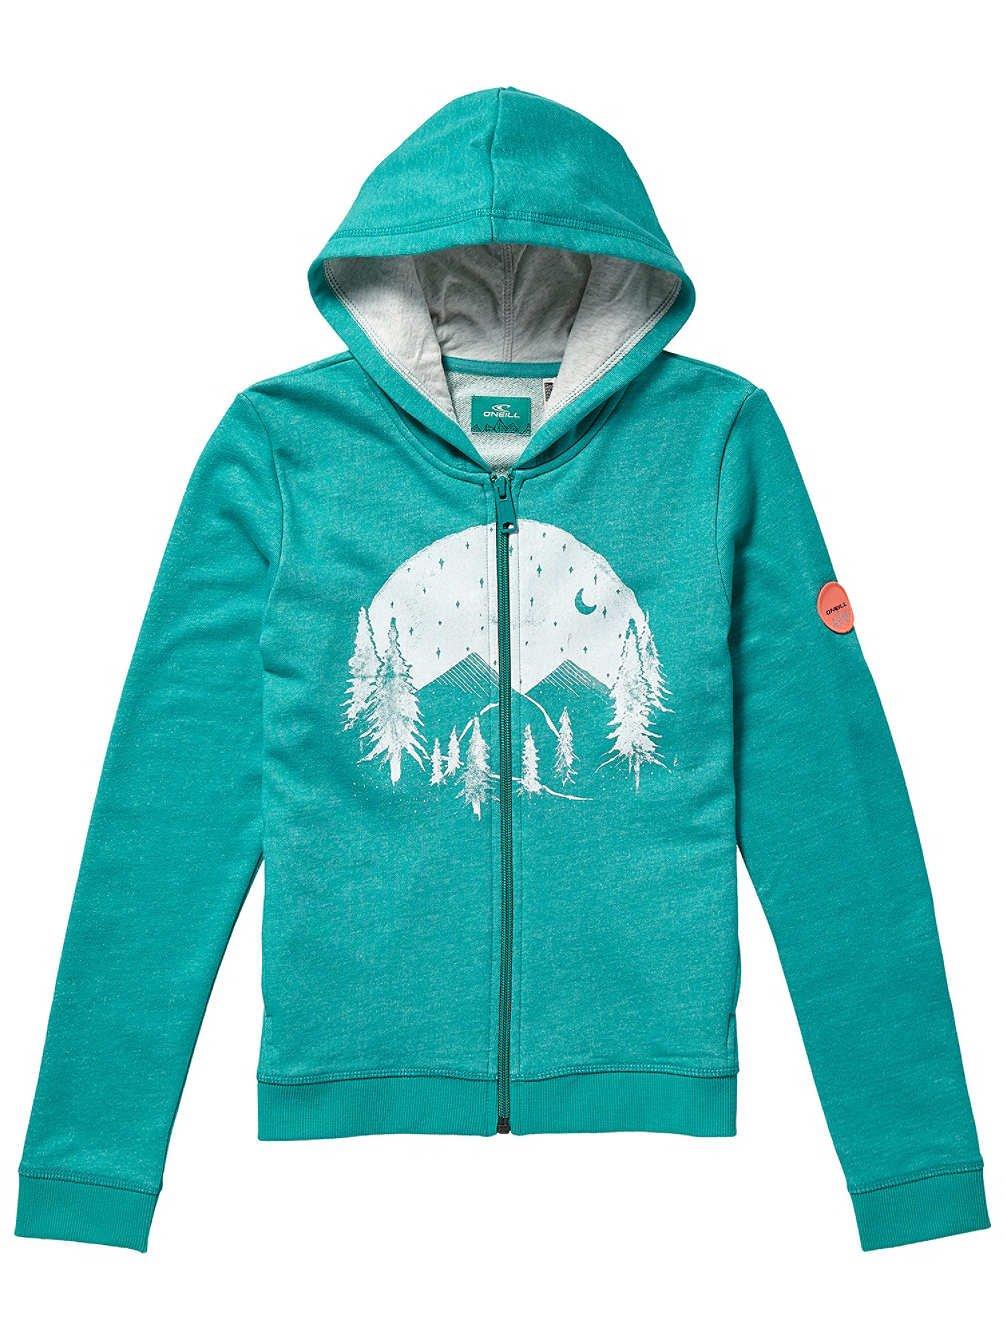 Turquoise 176 cm O'Neill Kinder Kapuzenjacke Fantastic Zip sweat à capuche Girls Sweat à Capuche Fille